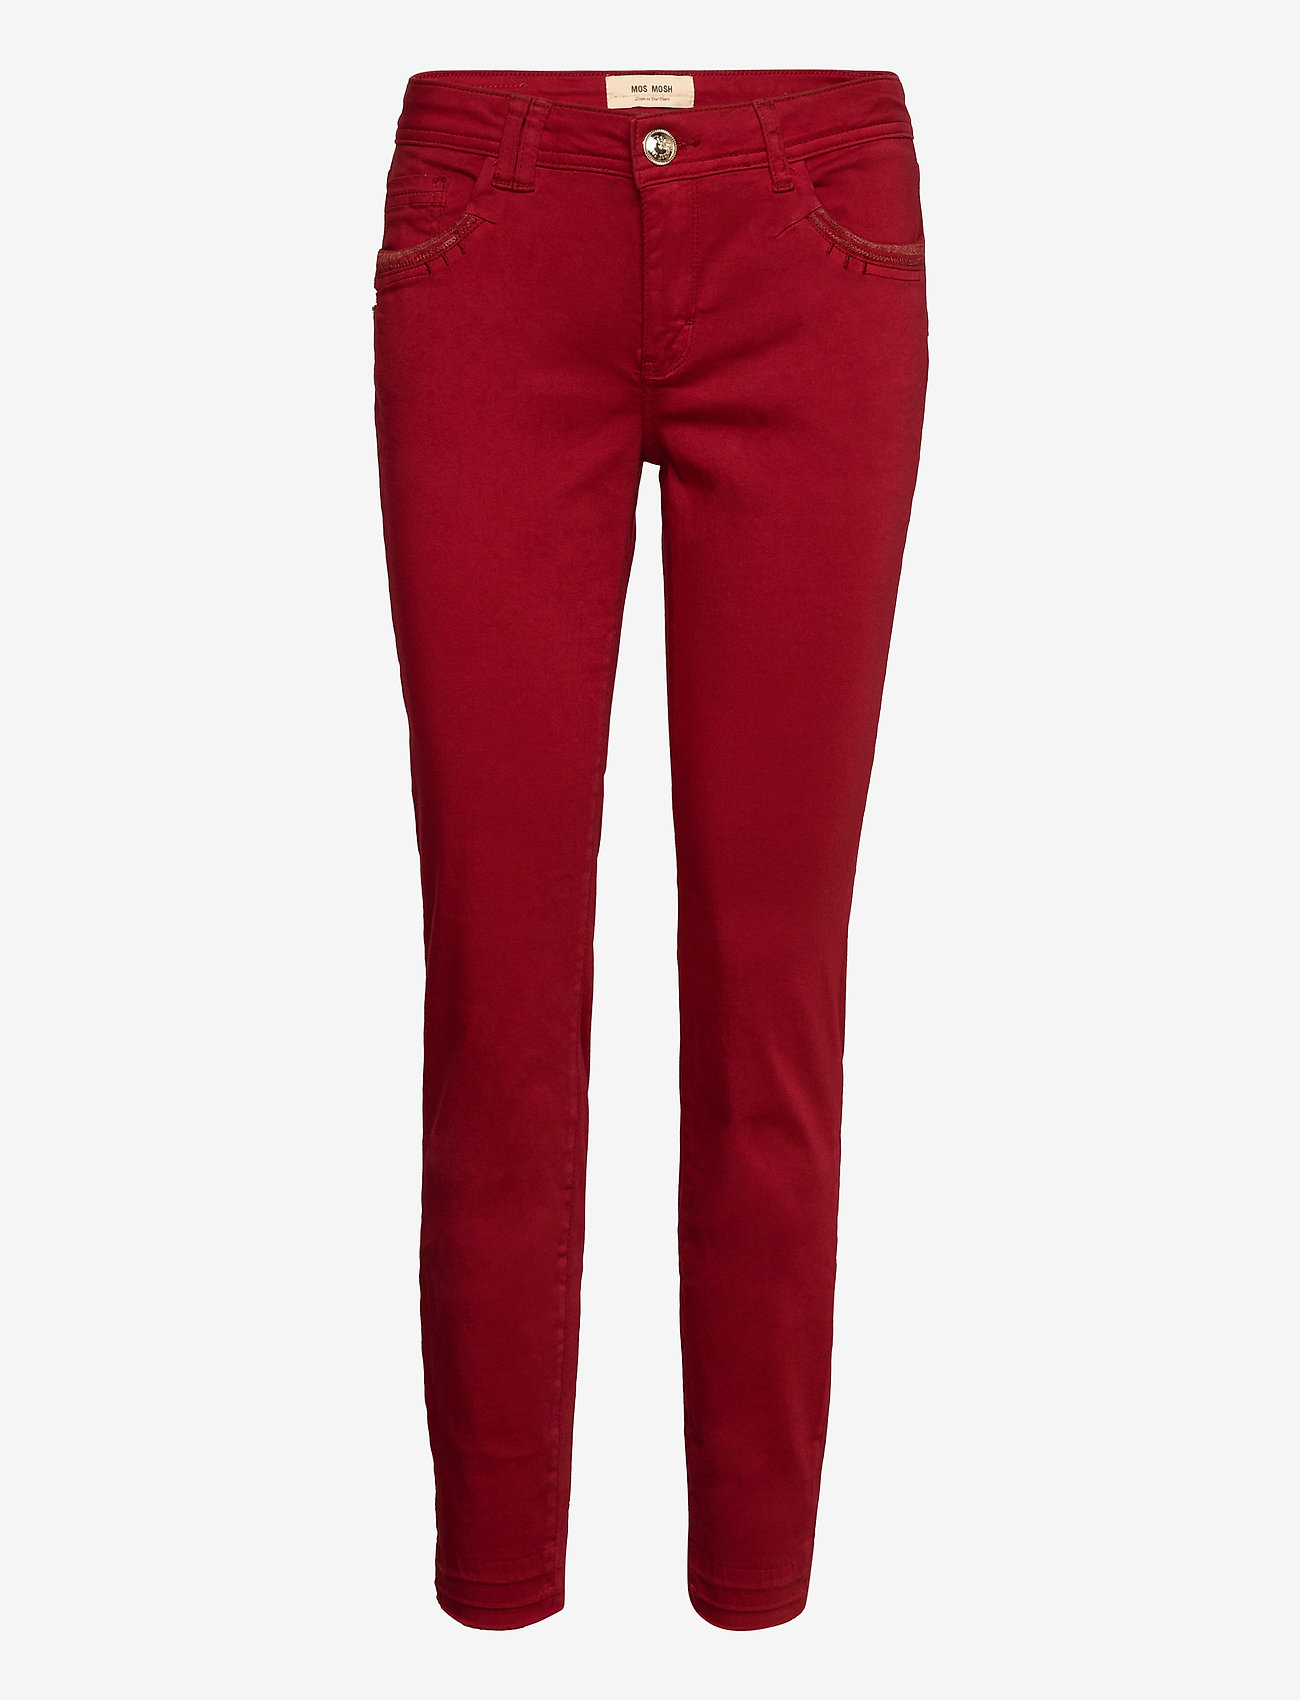 MOS MOSH - Sumner Jewel G.D Pant - slim jeans - biking red - 0